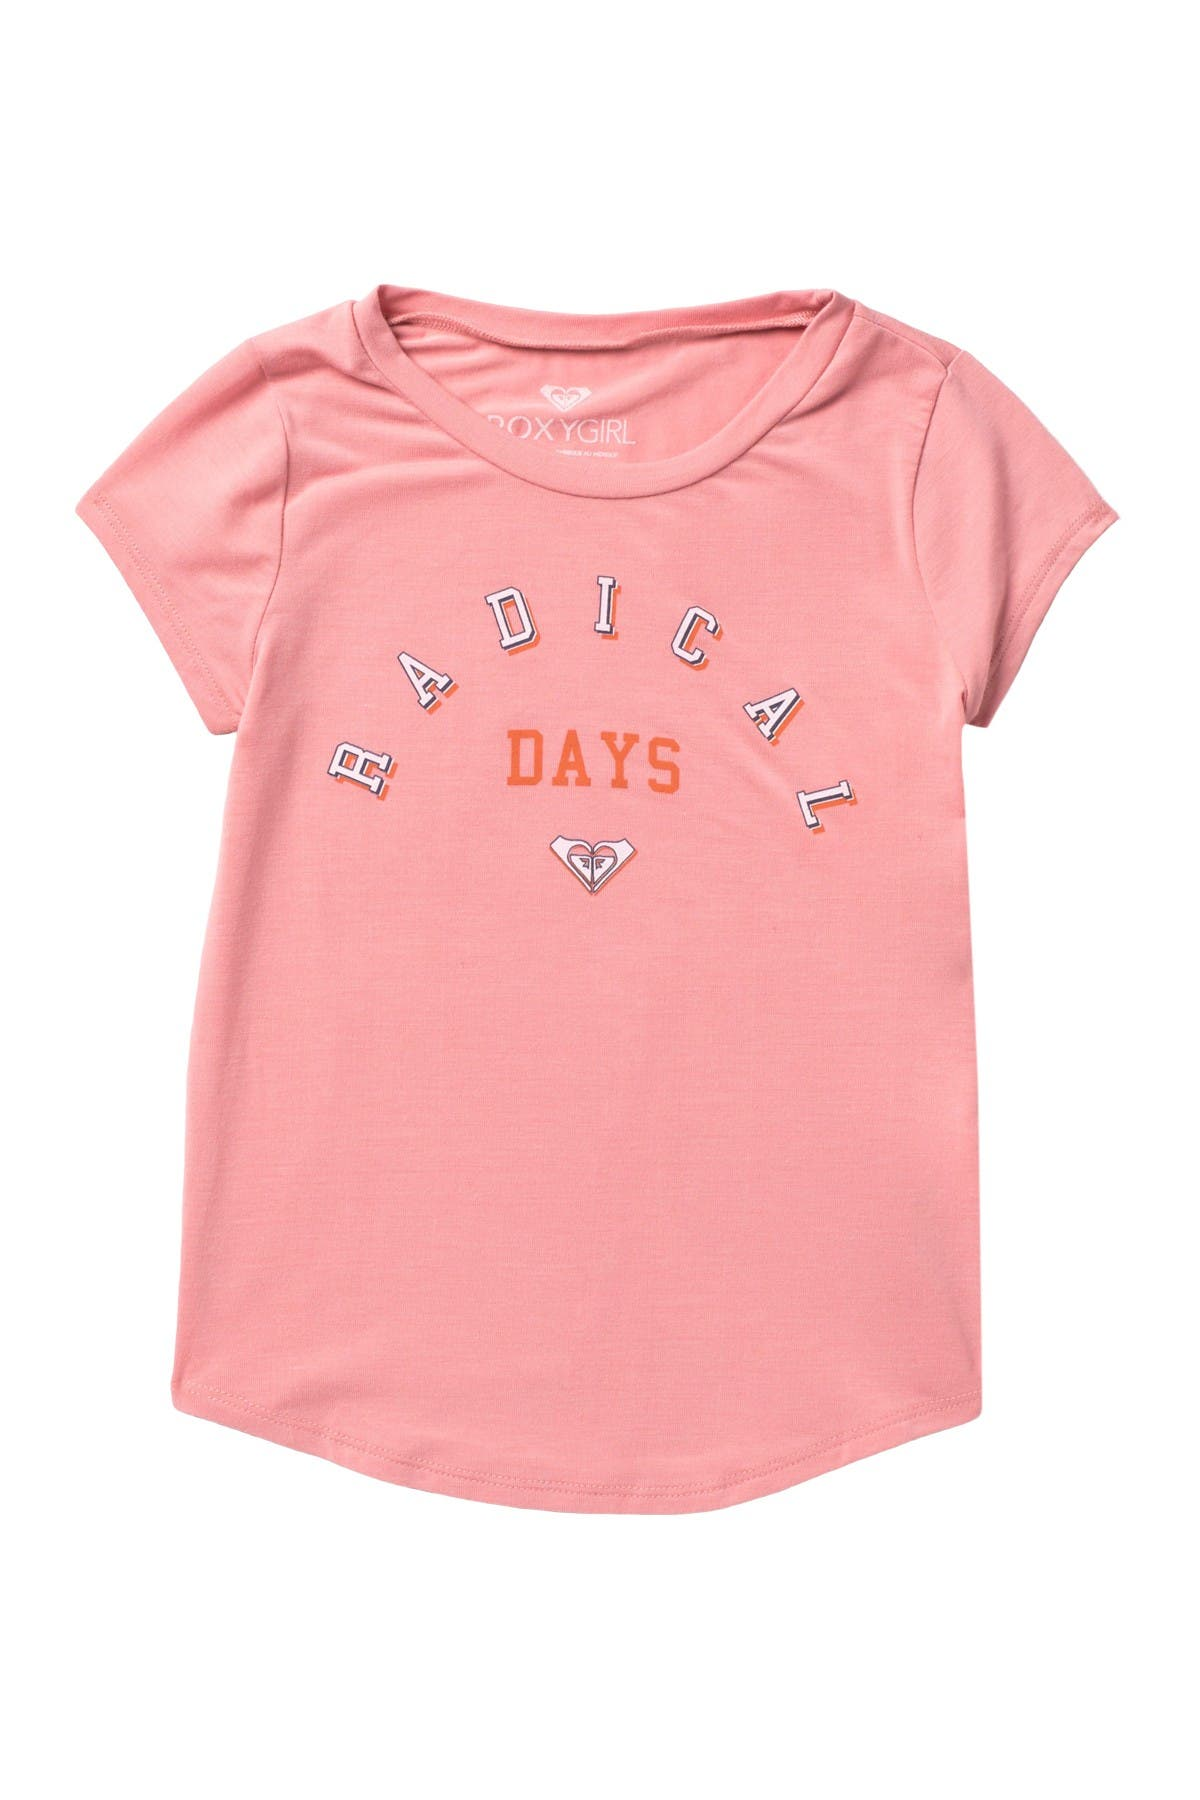 Roxy Girls Big Short Sleeve Crew T-Shirt